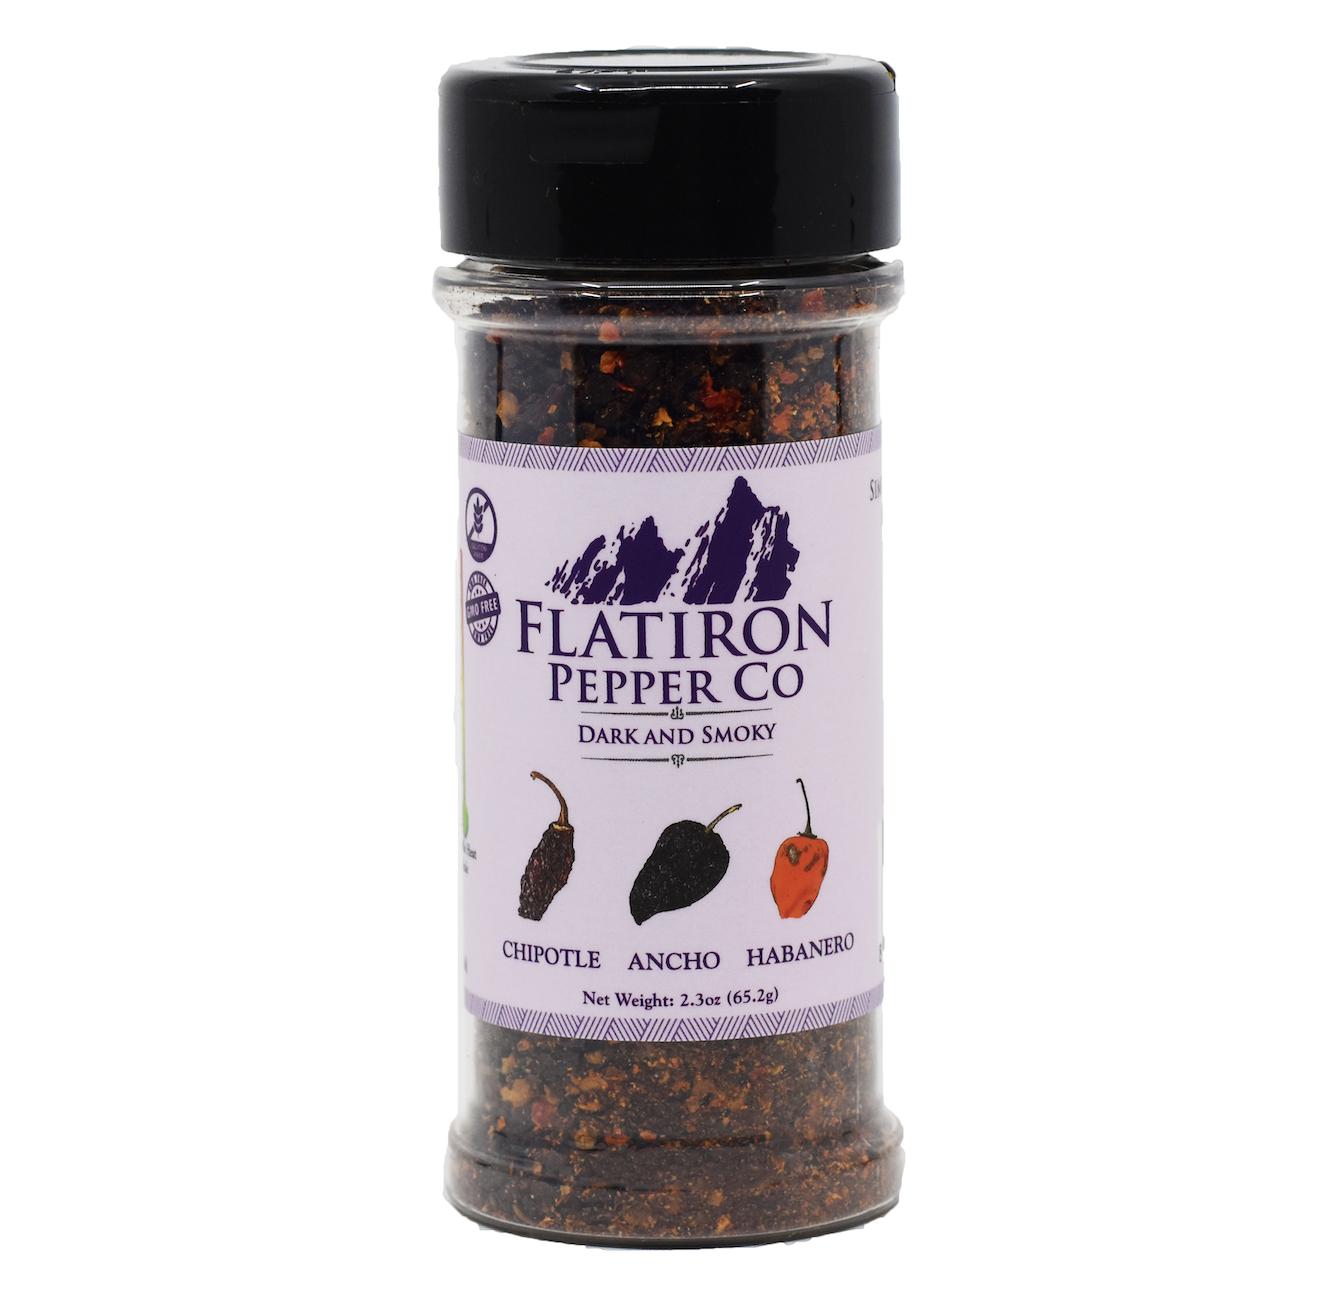 Dark and Smoky  - Flatiron Pepper Co